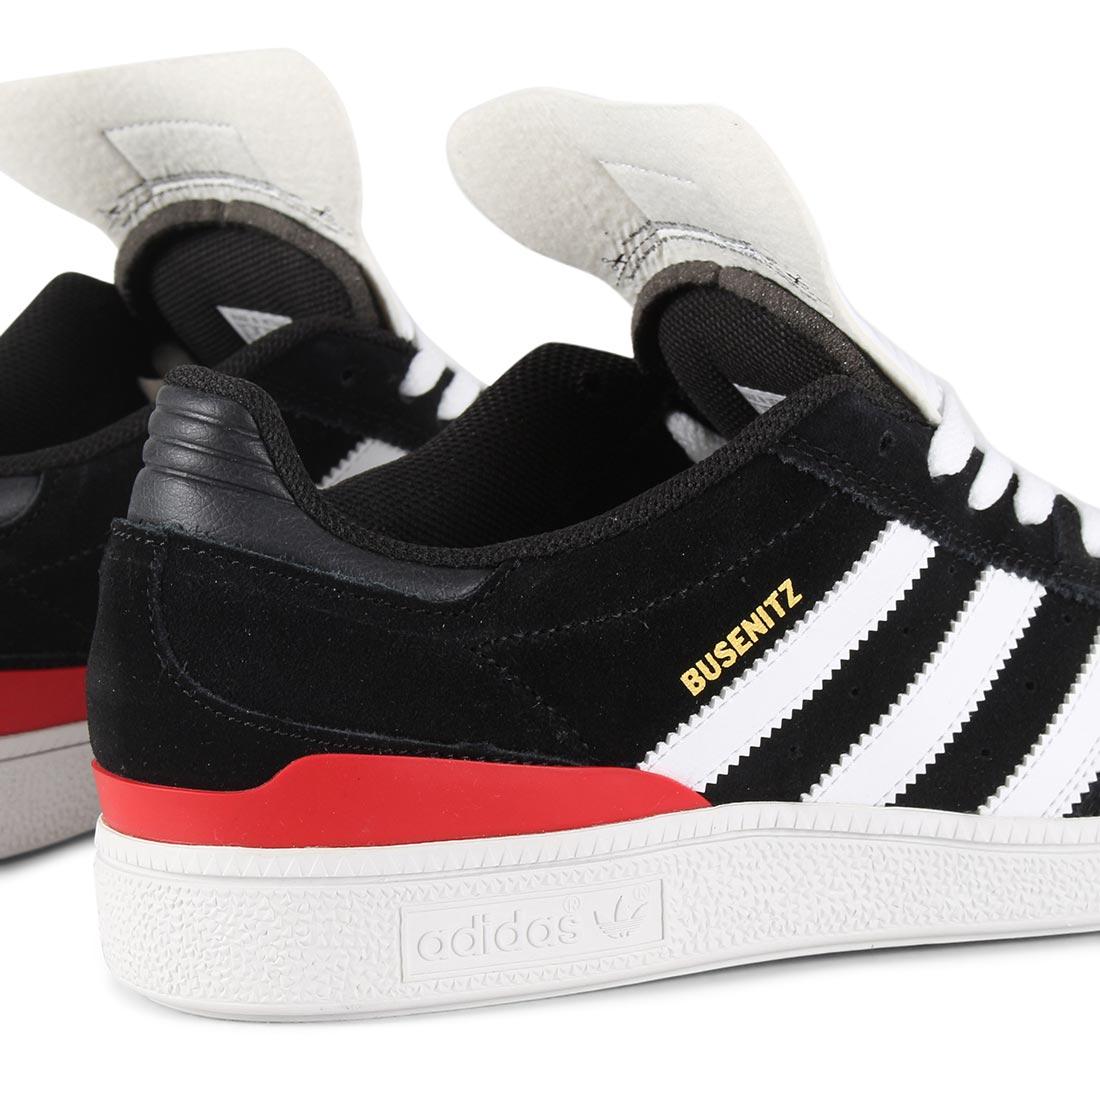 Adidas Busenitz Pro Shoes Core Black White Scarlet